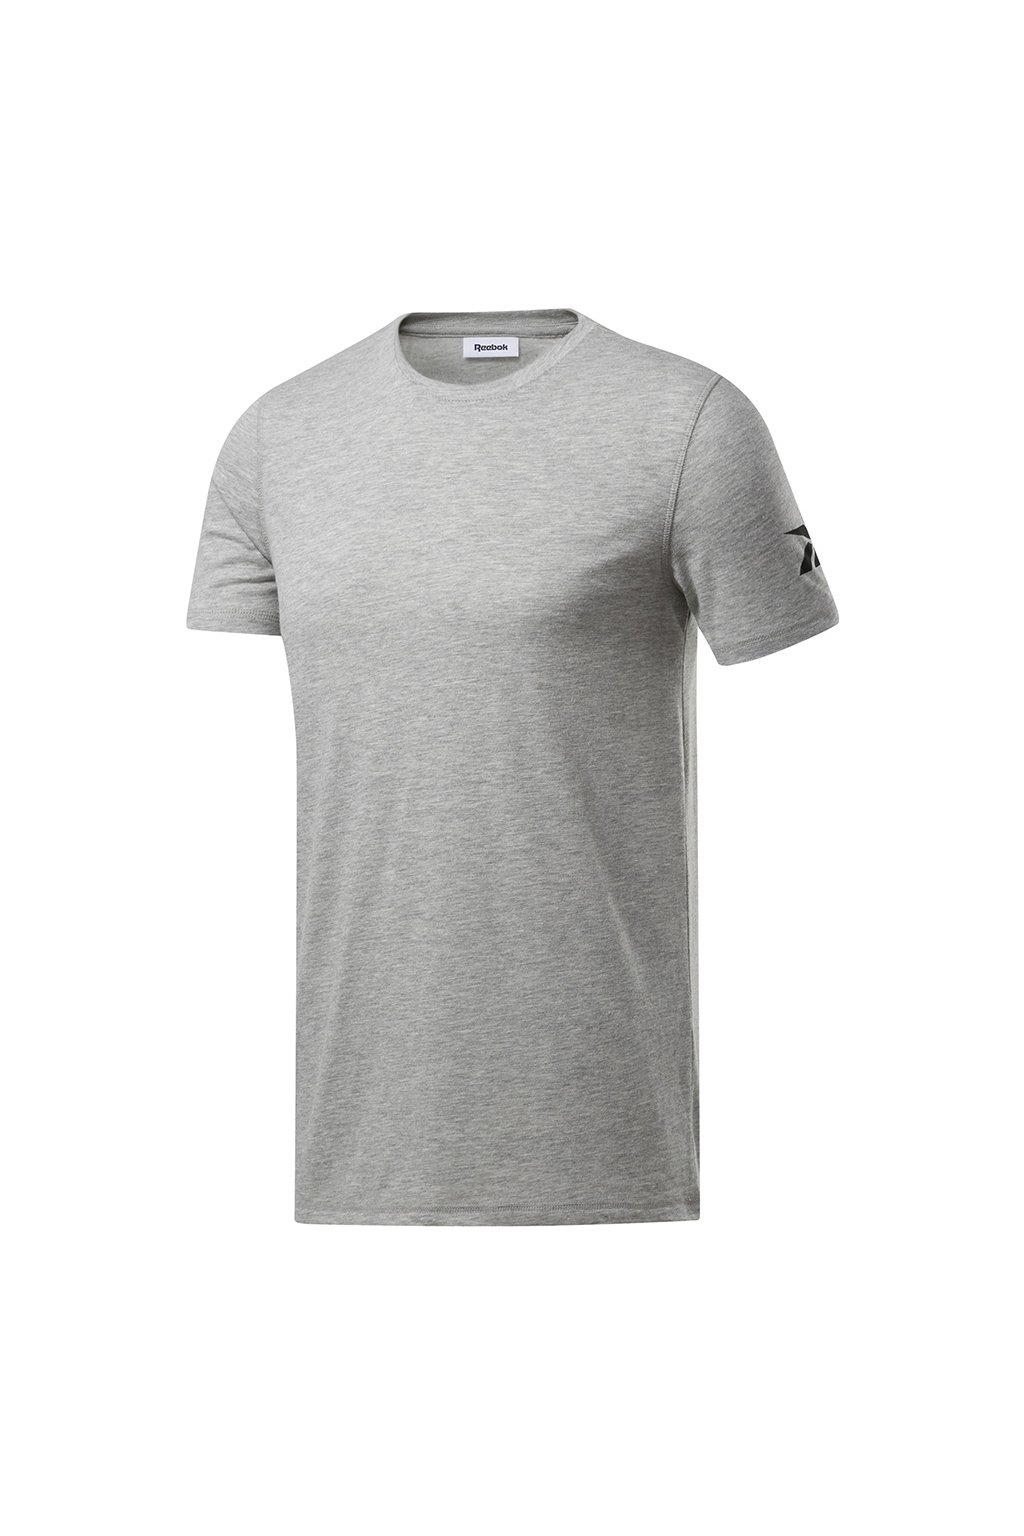 Pánske tričko Reebok Wor We Comm SS Tee šedé FP9101